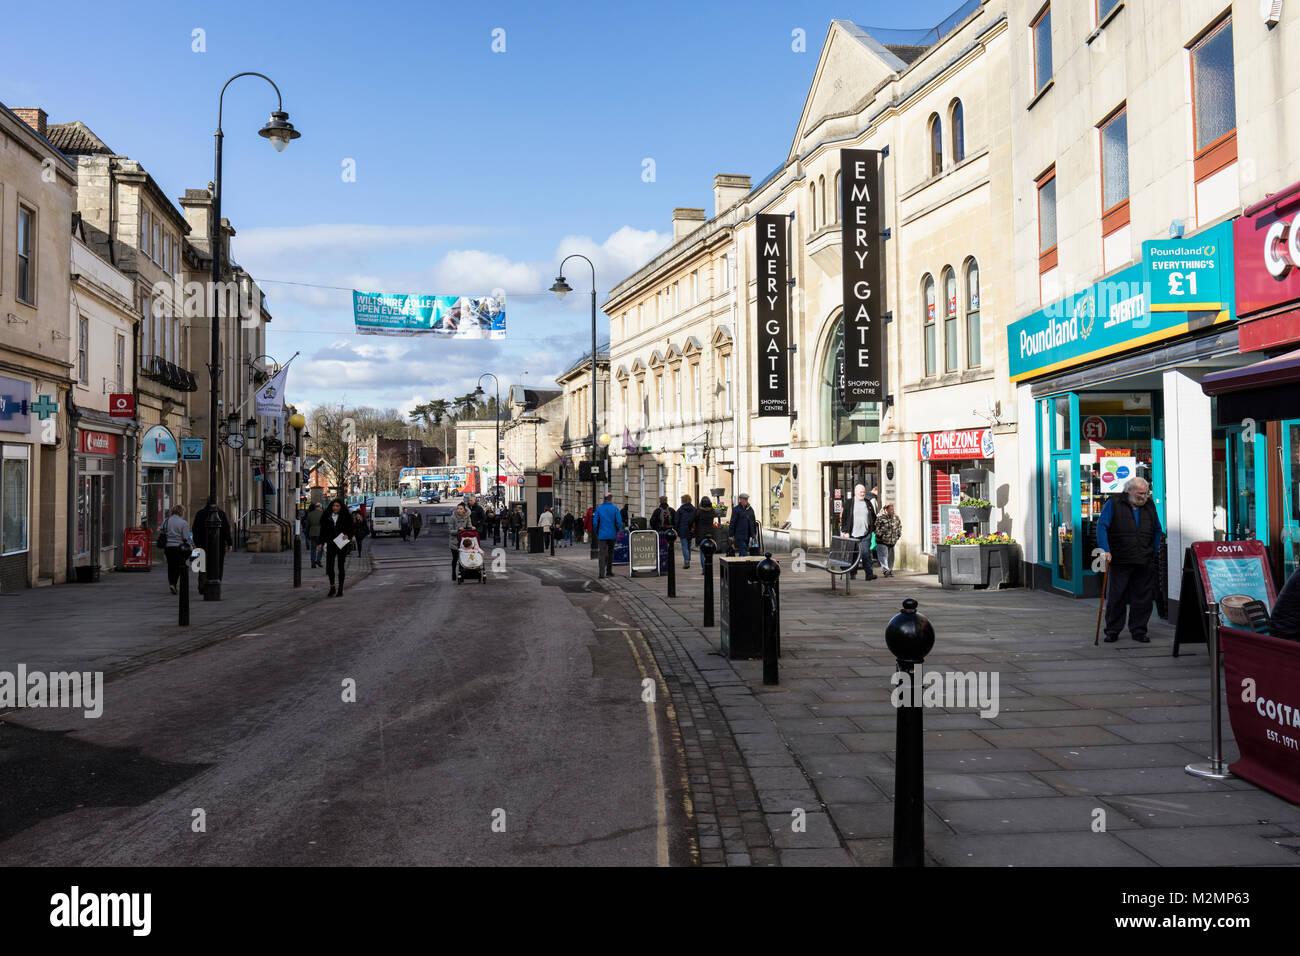 Chippenham high street, Wiltshire, England - Stock Image